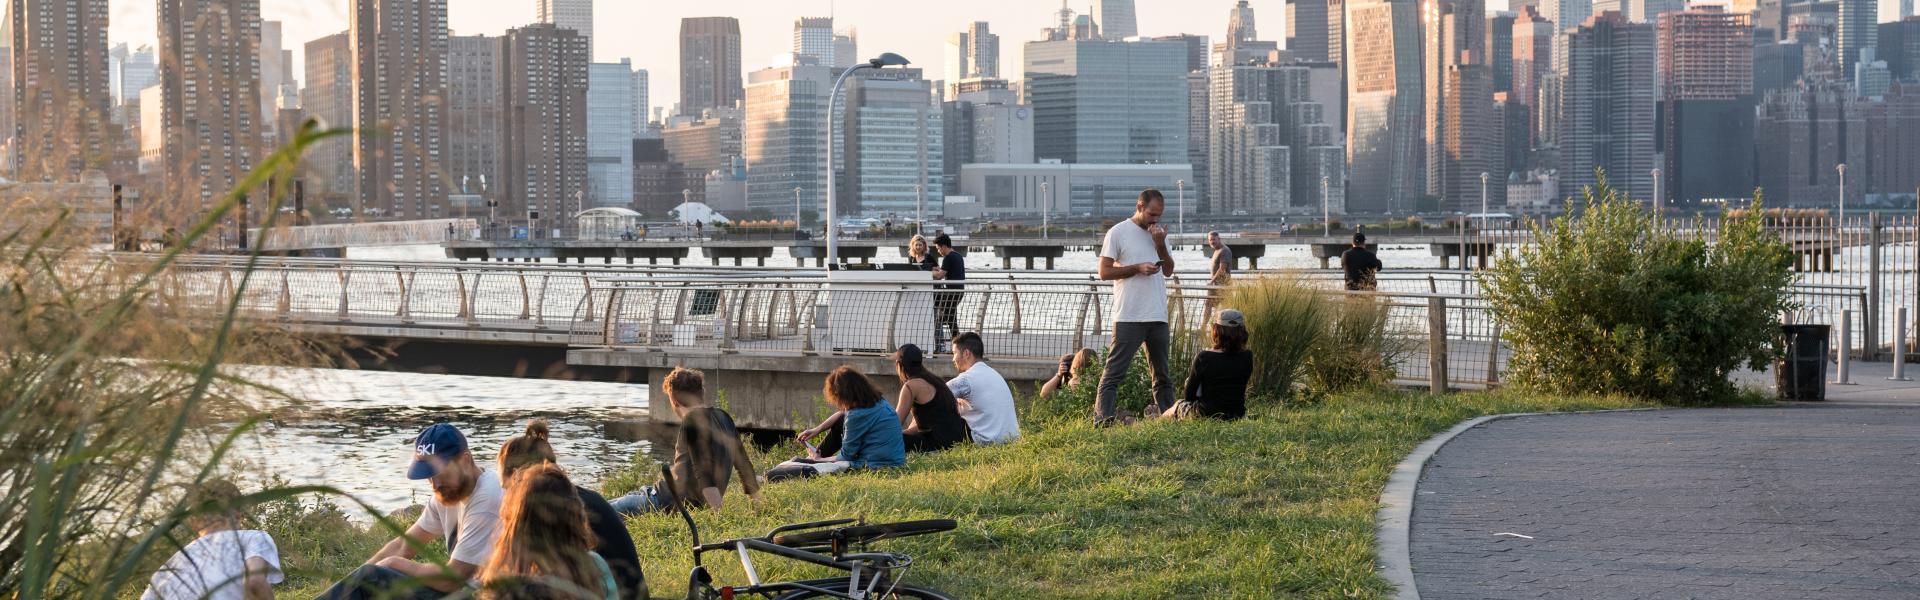 Transmitter park, green point, brooklyn, skyline, park, summer